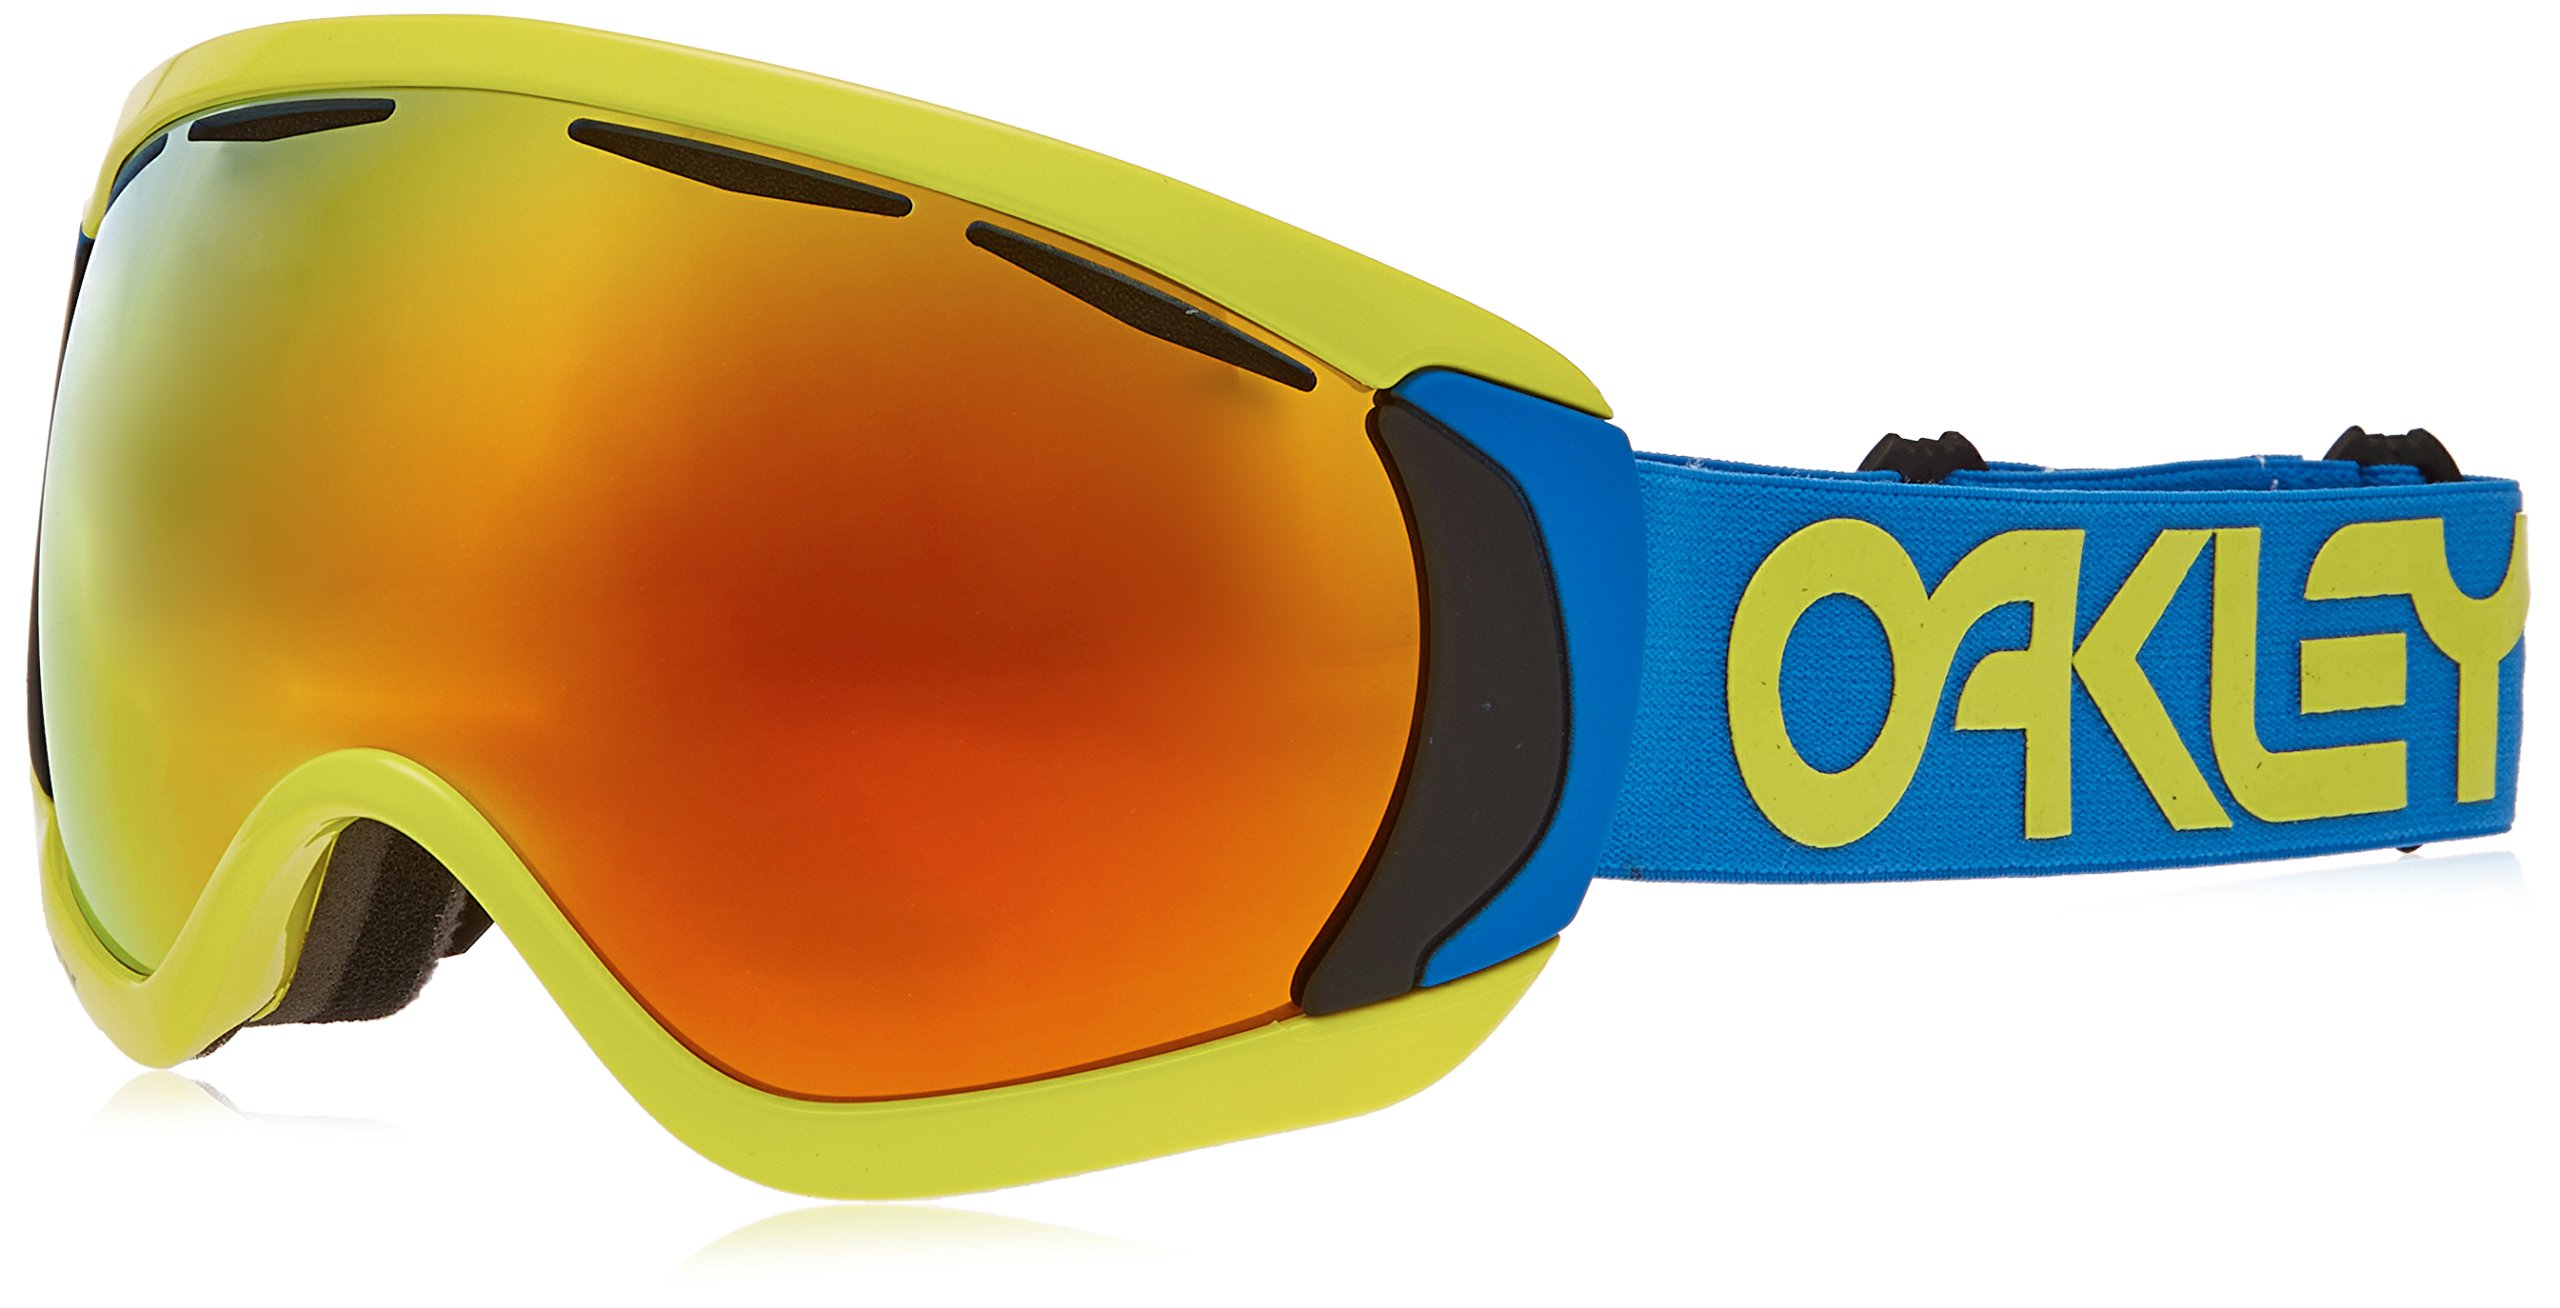 Oakley OO7047-14 Canopy Eyewear, Factory Pilot Retina Blue, Fire Iridium Lens by Oakley